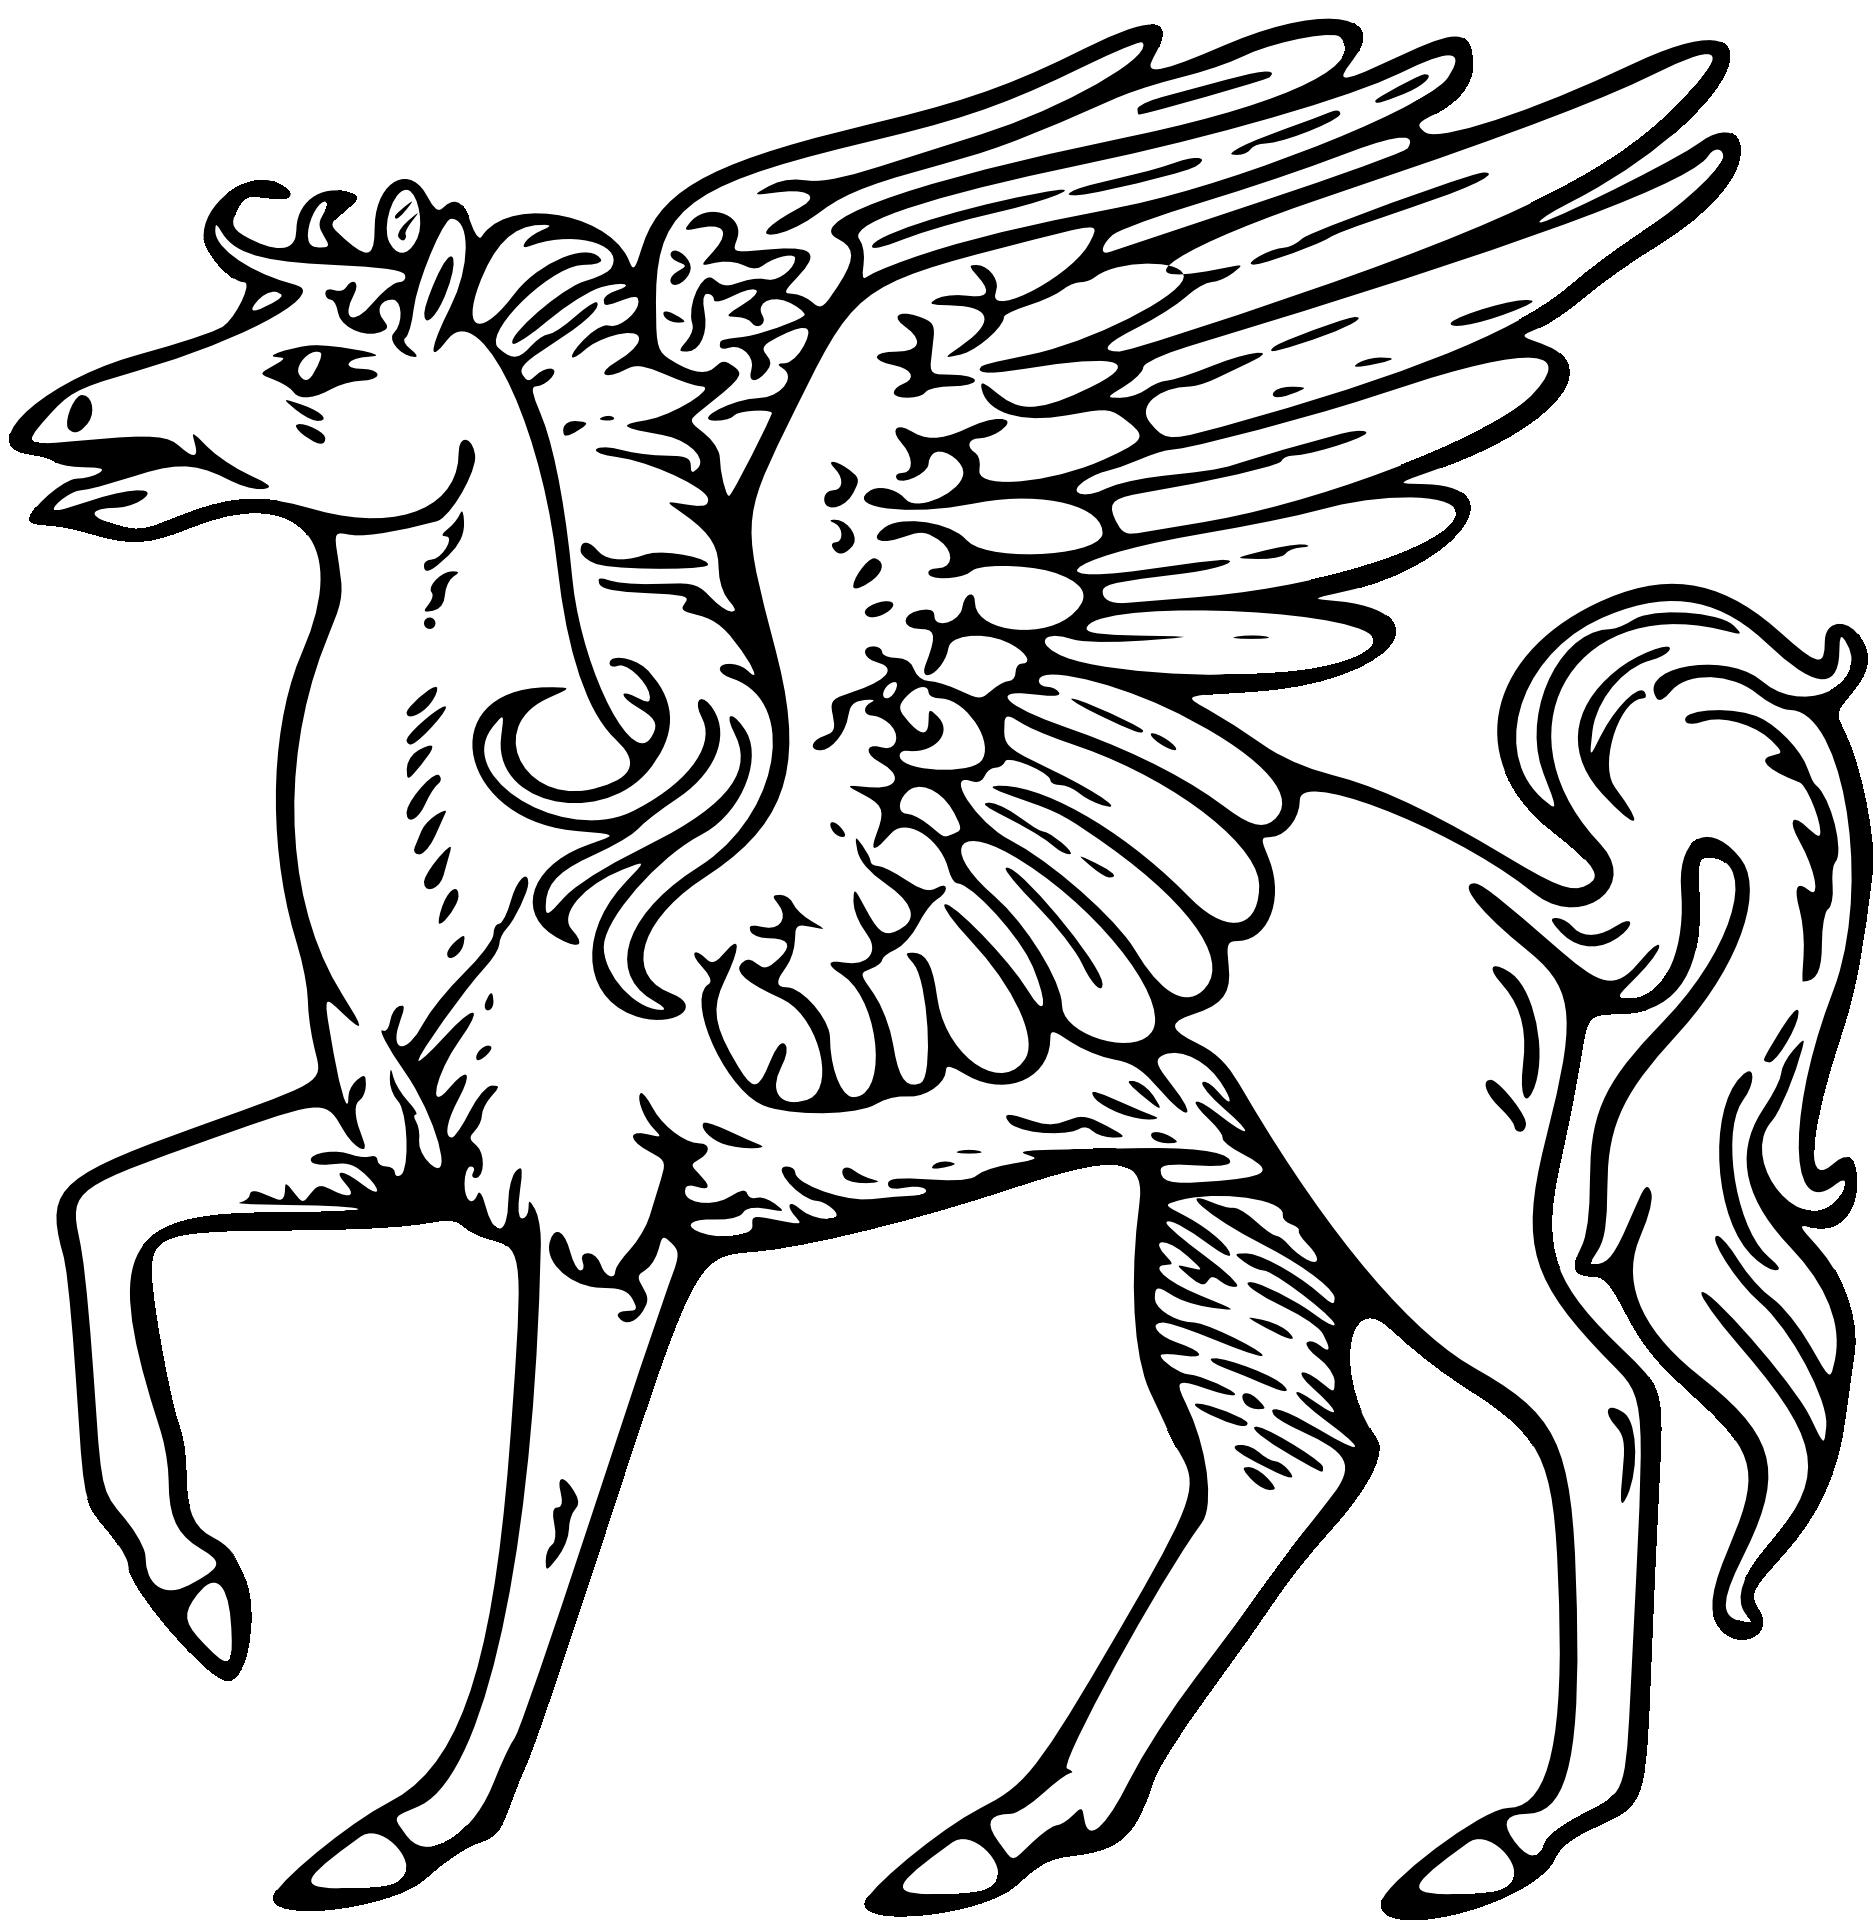 Kon Ze Skrzydlami Pegasus Kolorowanka Do Druku